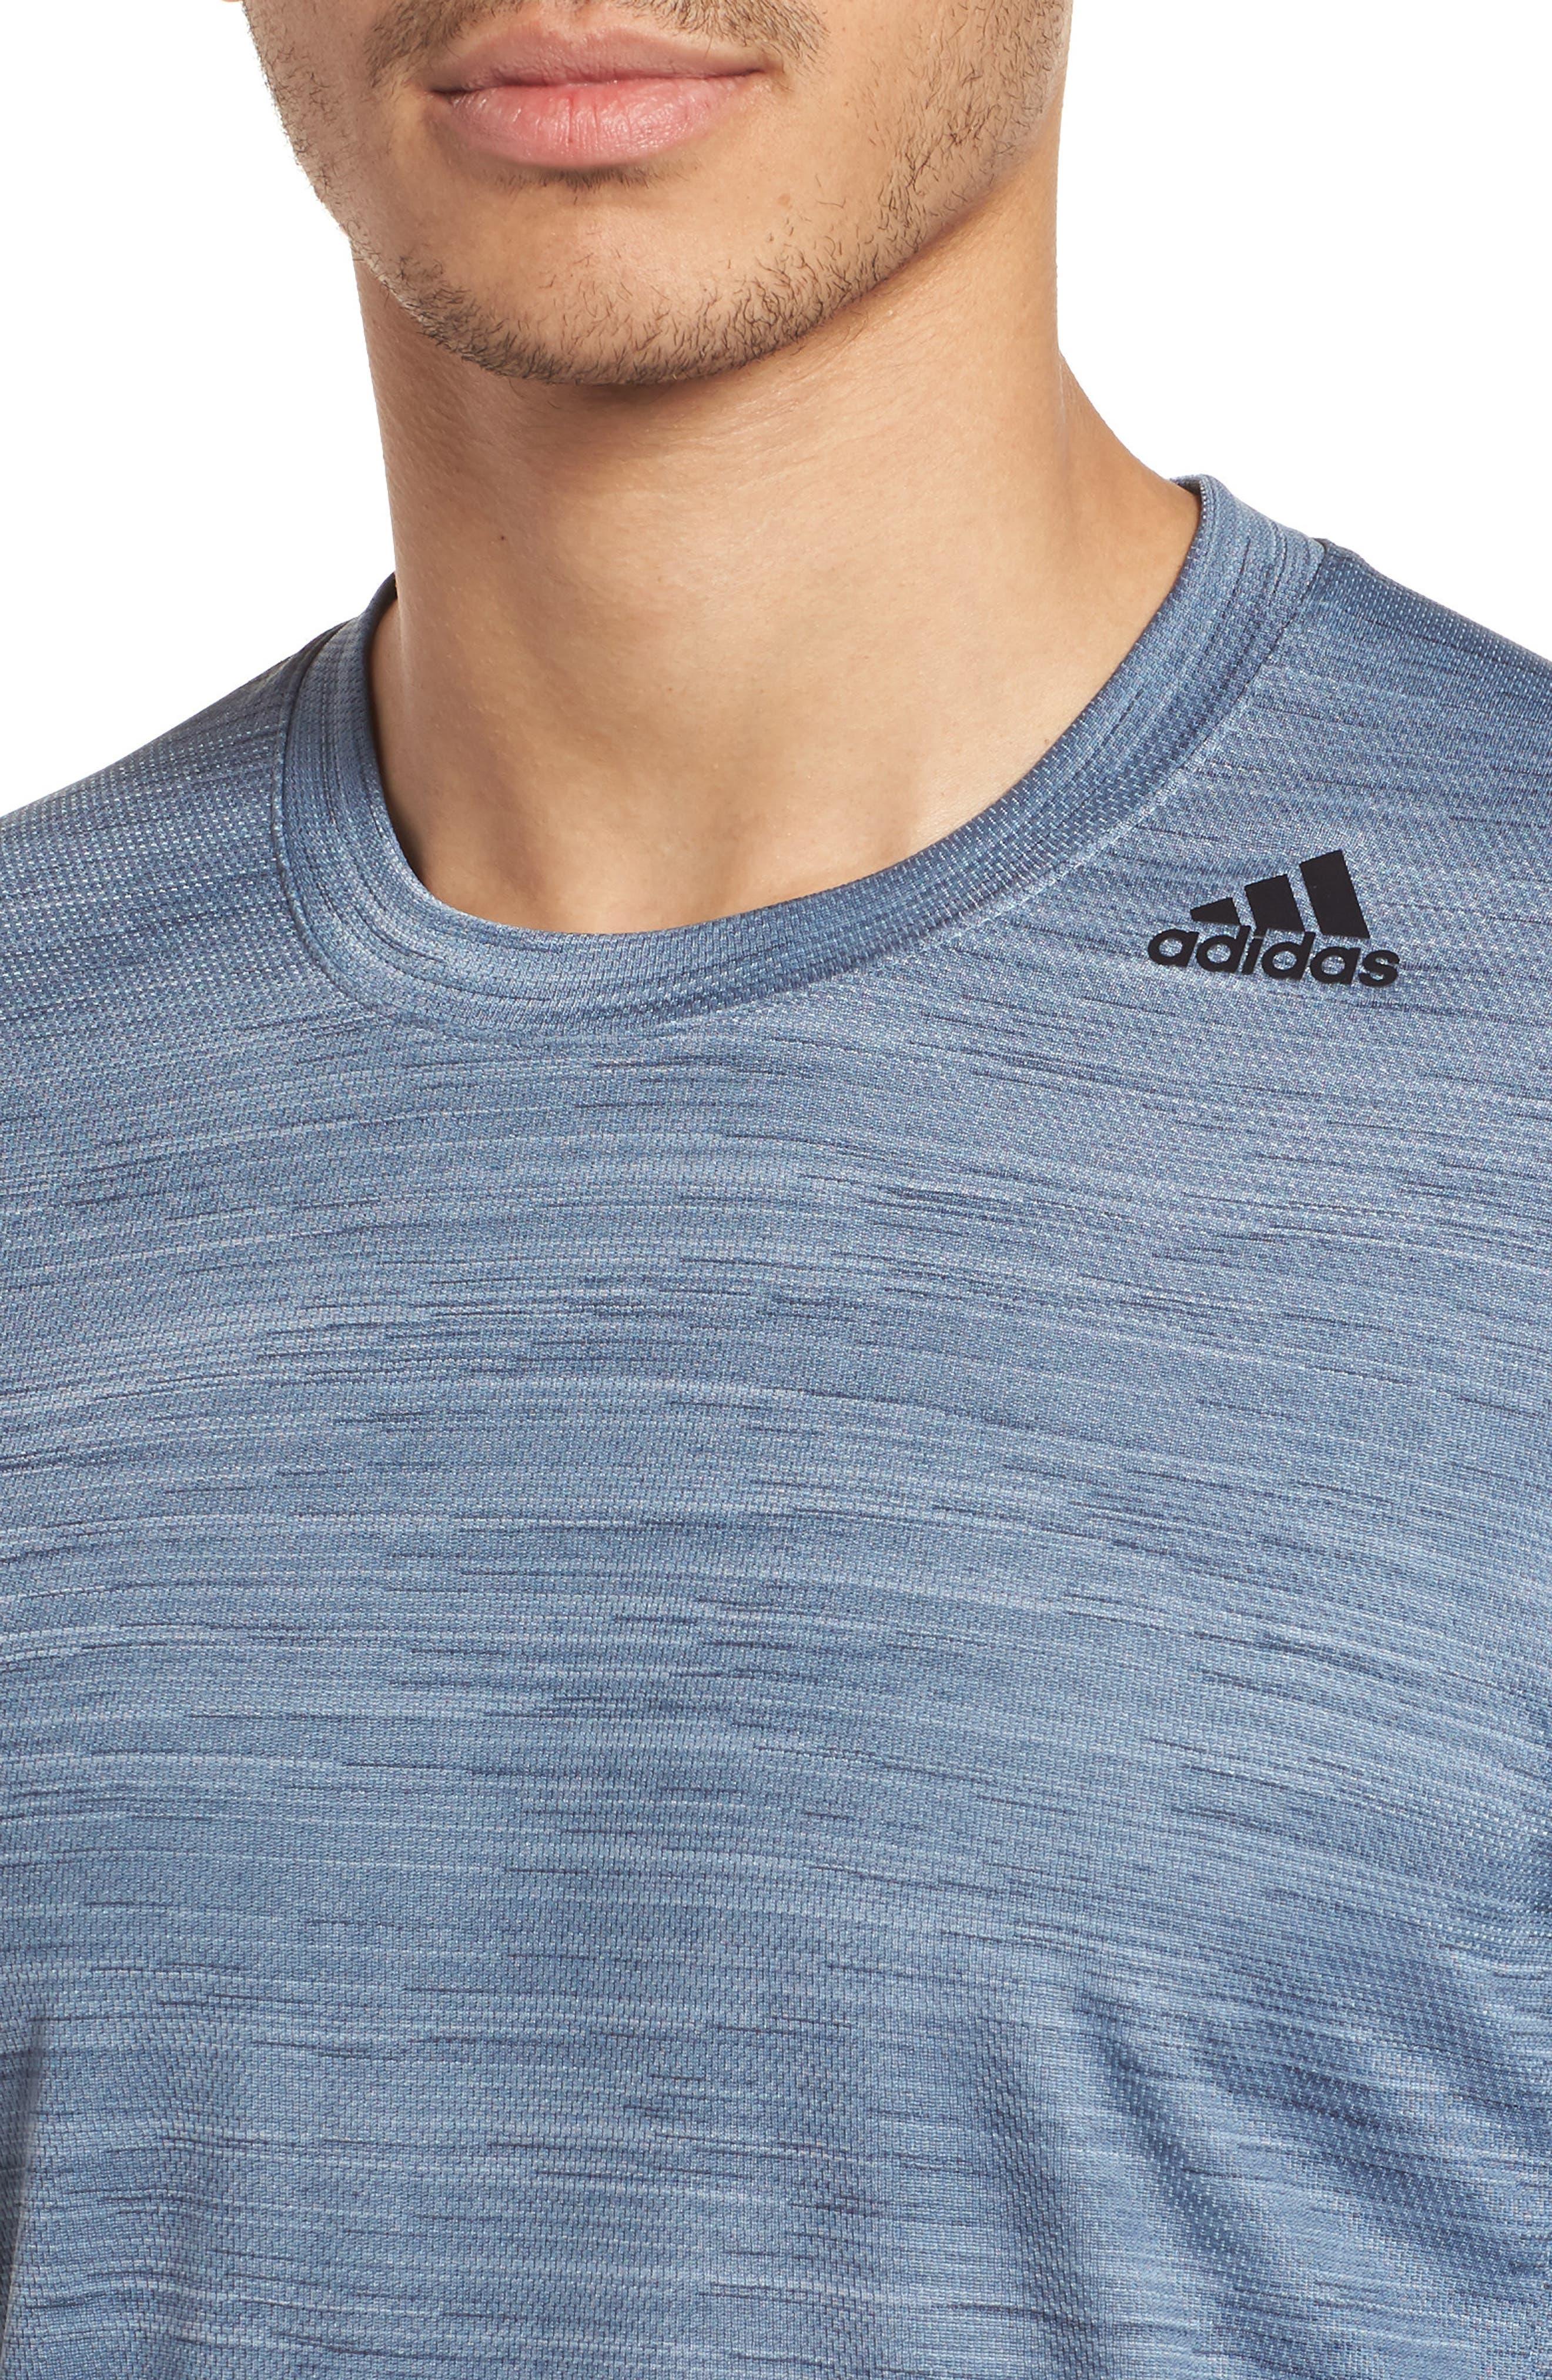 Ultimate Tech Long Sleeve T-Shirt,                             Alternate thumbnail 7, color,